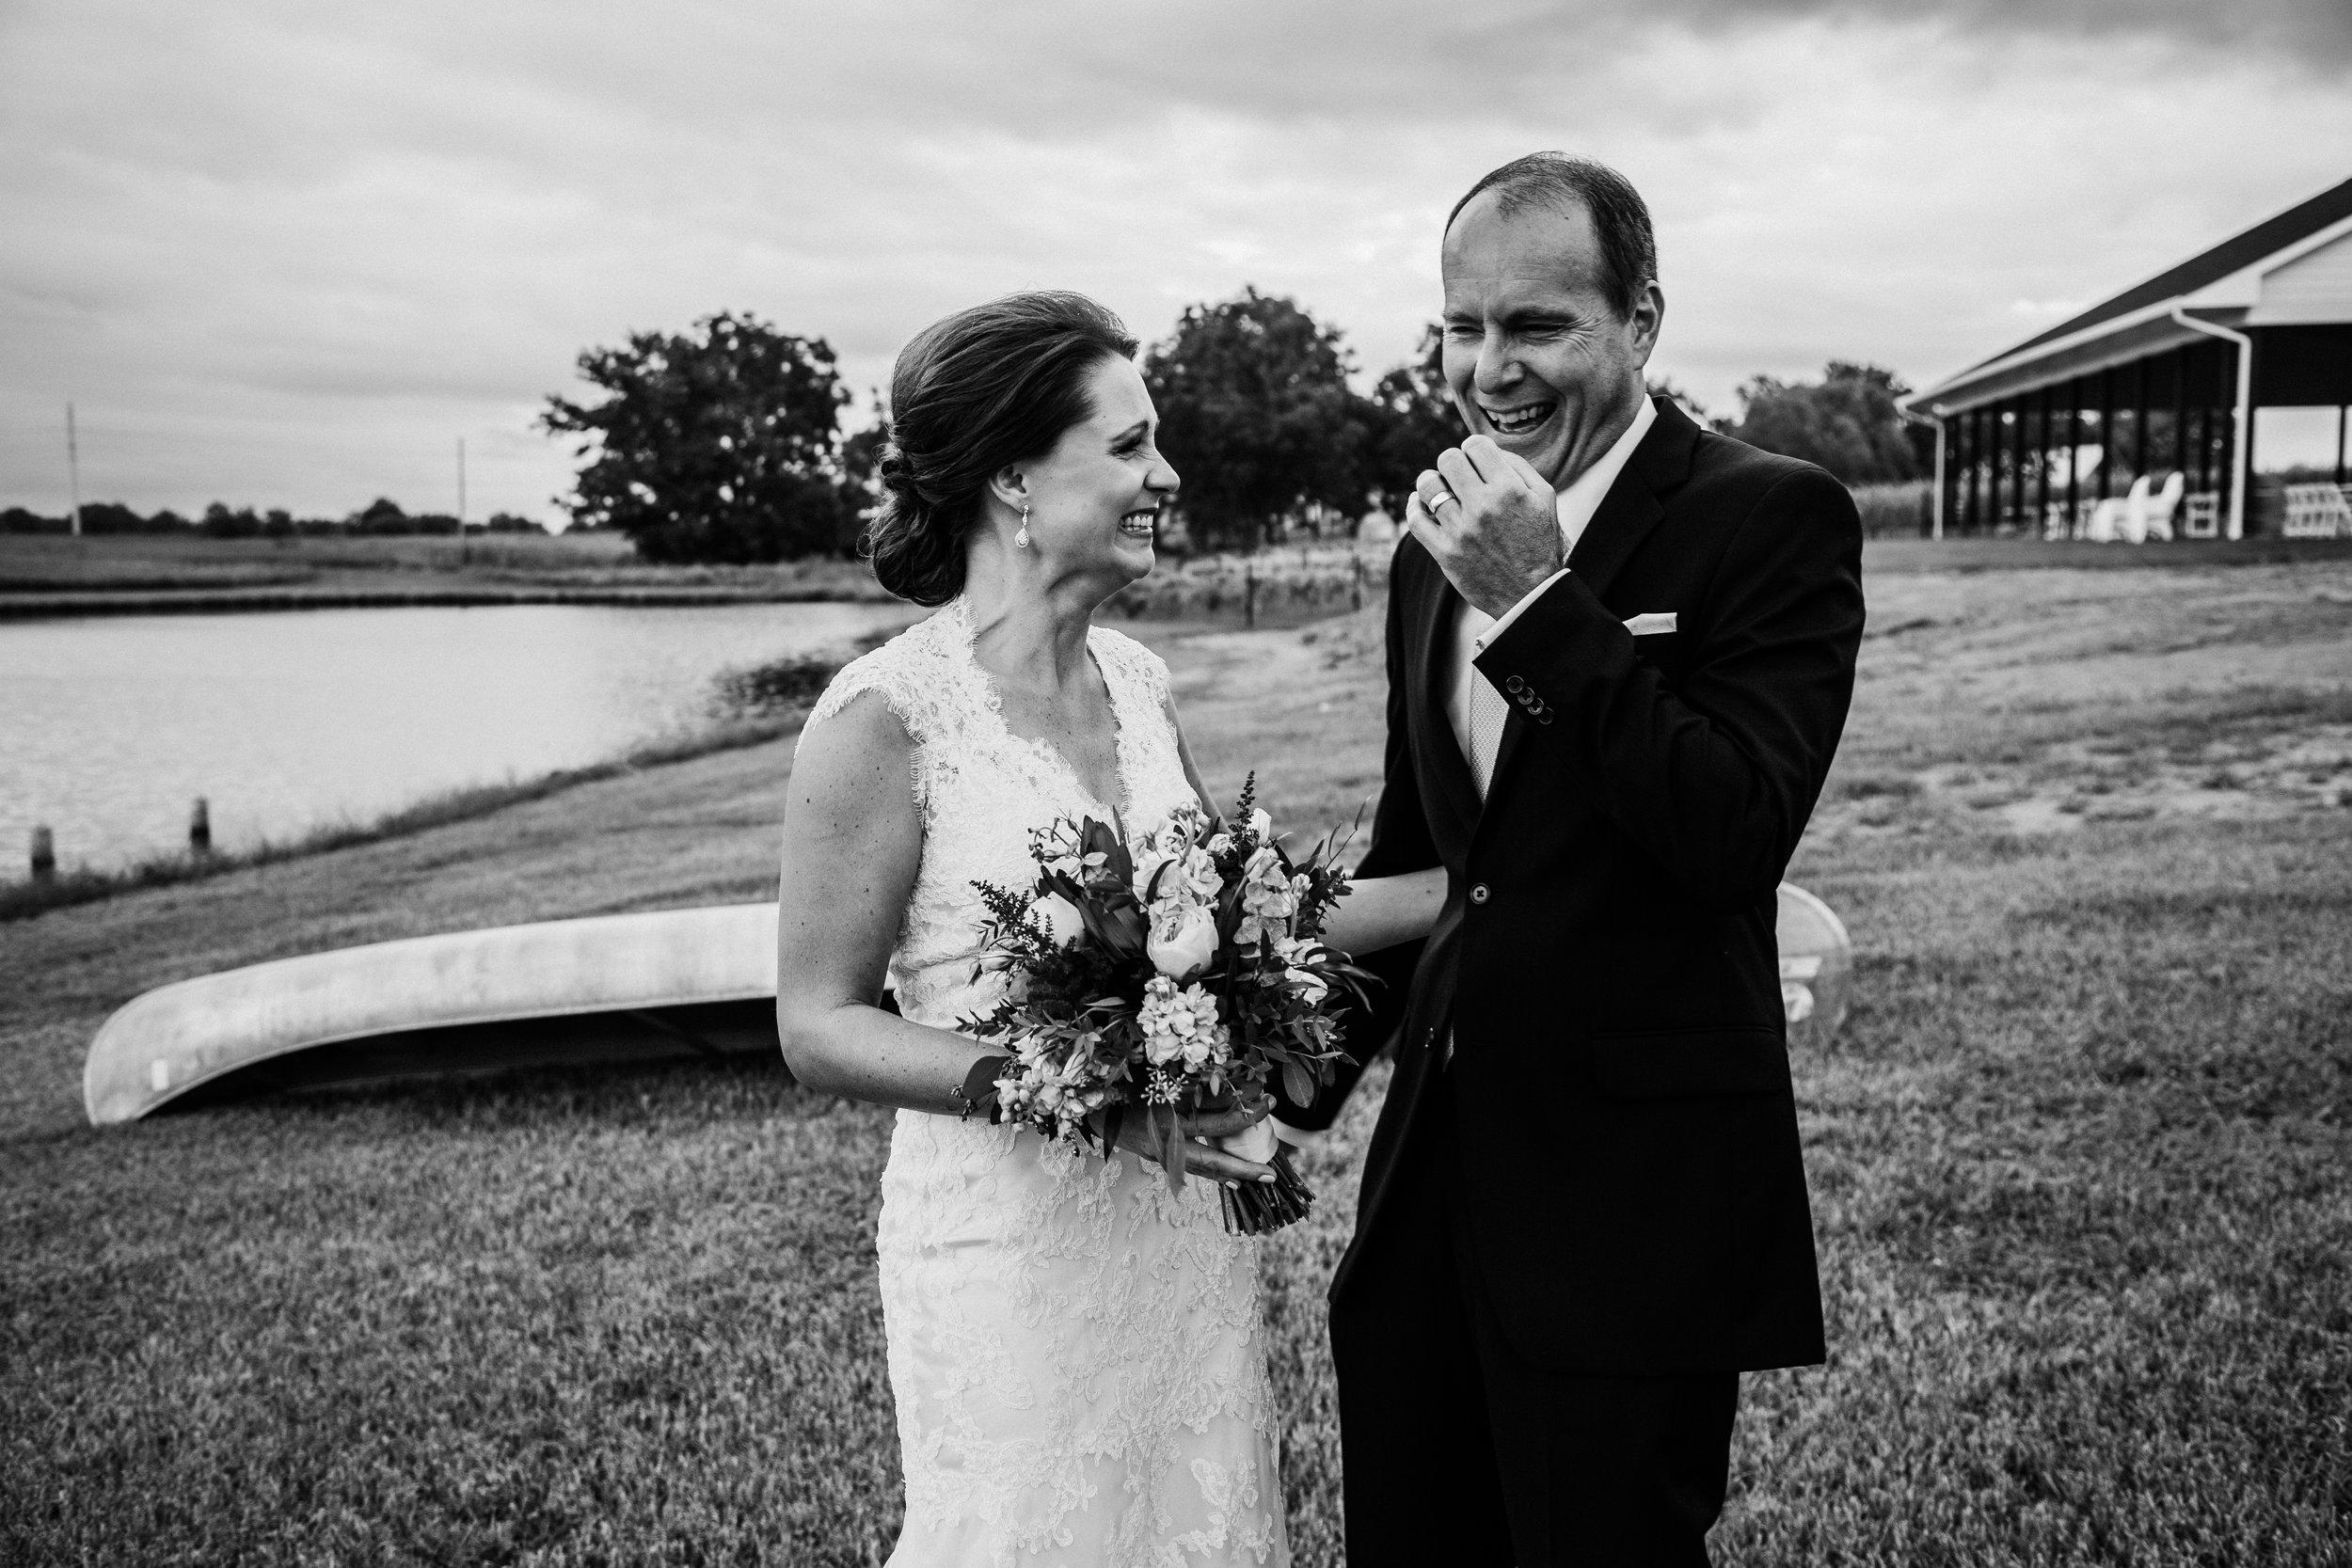 ST LOUIS ENGAGMENT COUPLE WEDDING PHOTOGRAPHER - DESTINATION - MISSOURI-8.jpg